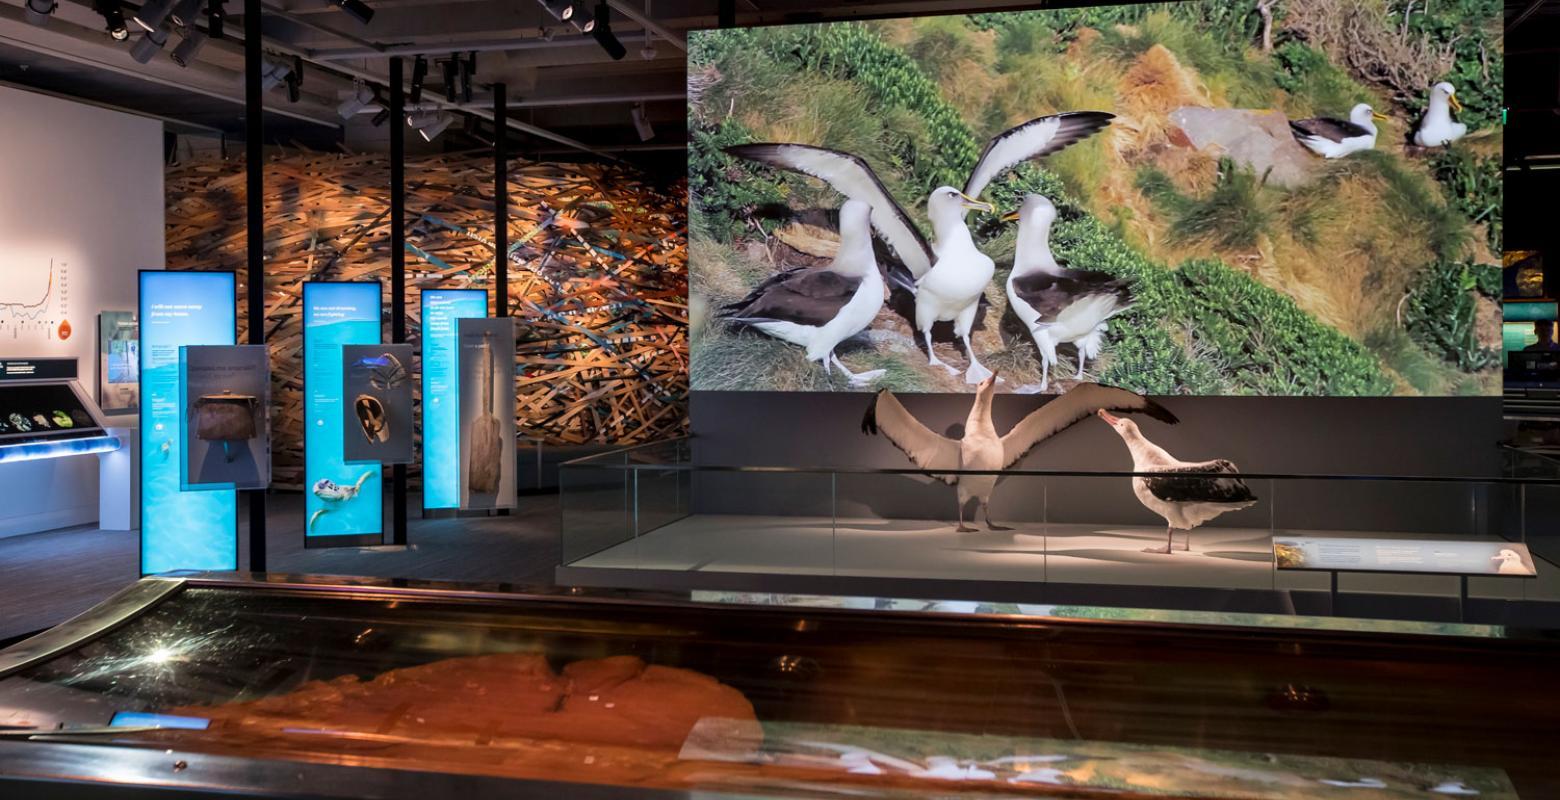 Taxidermy albatross on display